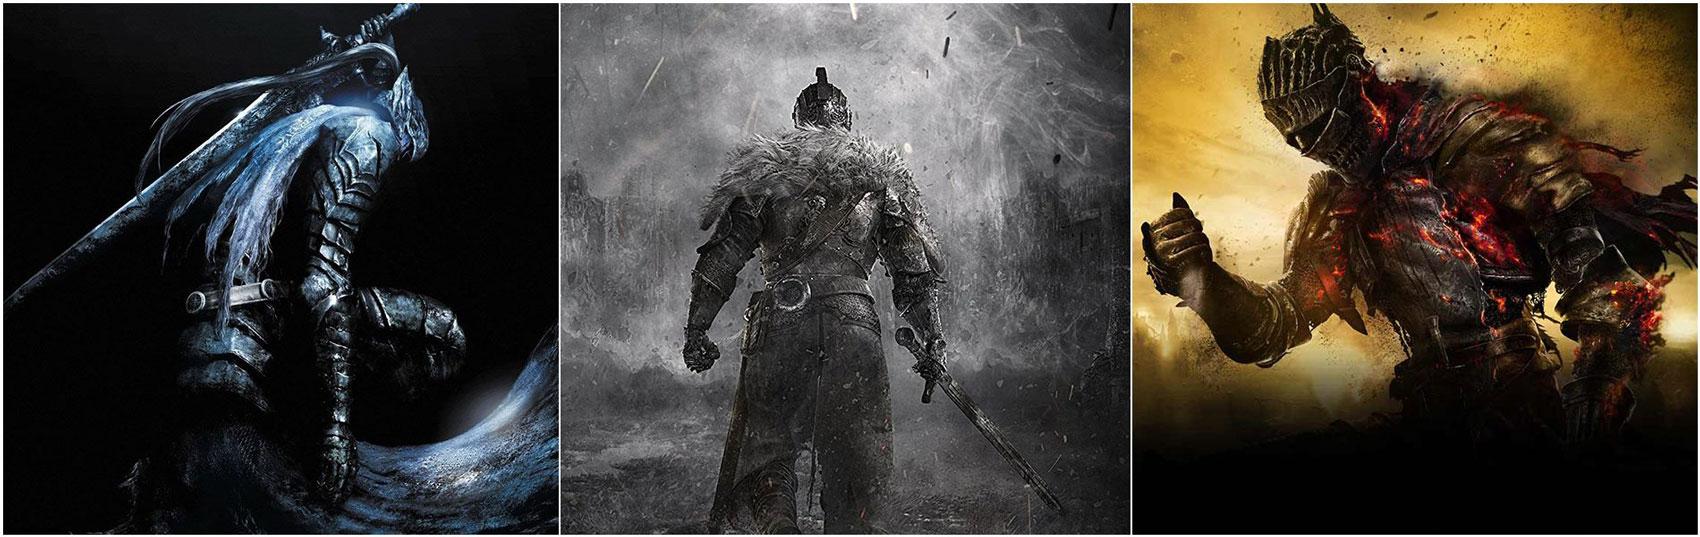 Dark Souls, varie immagini del gioco.